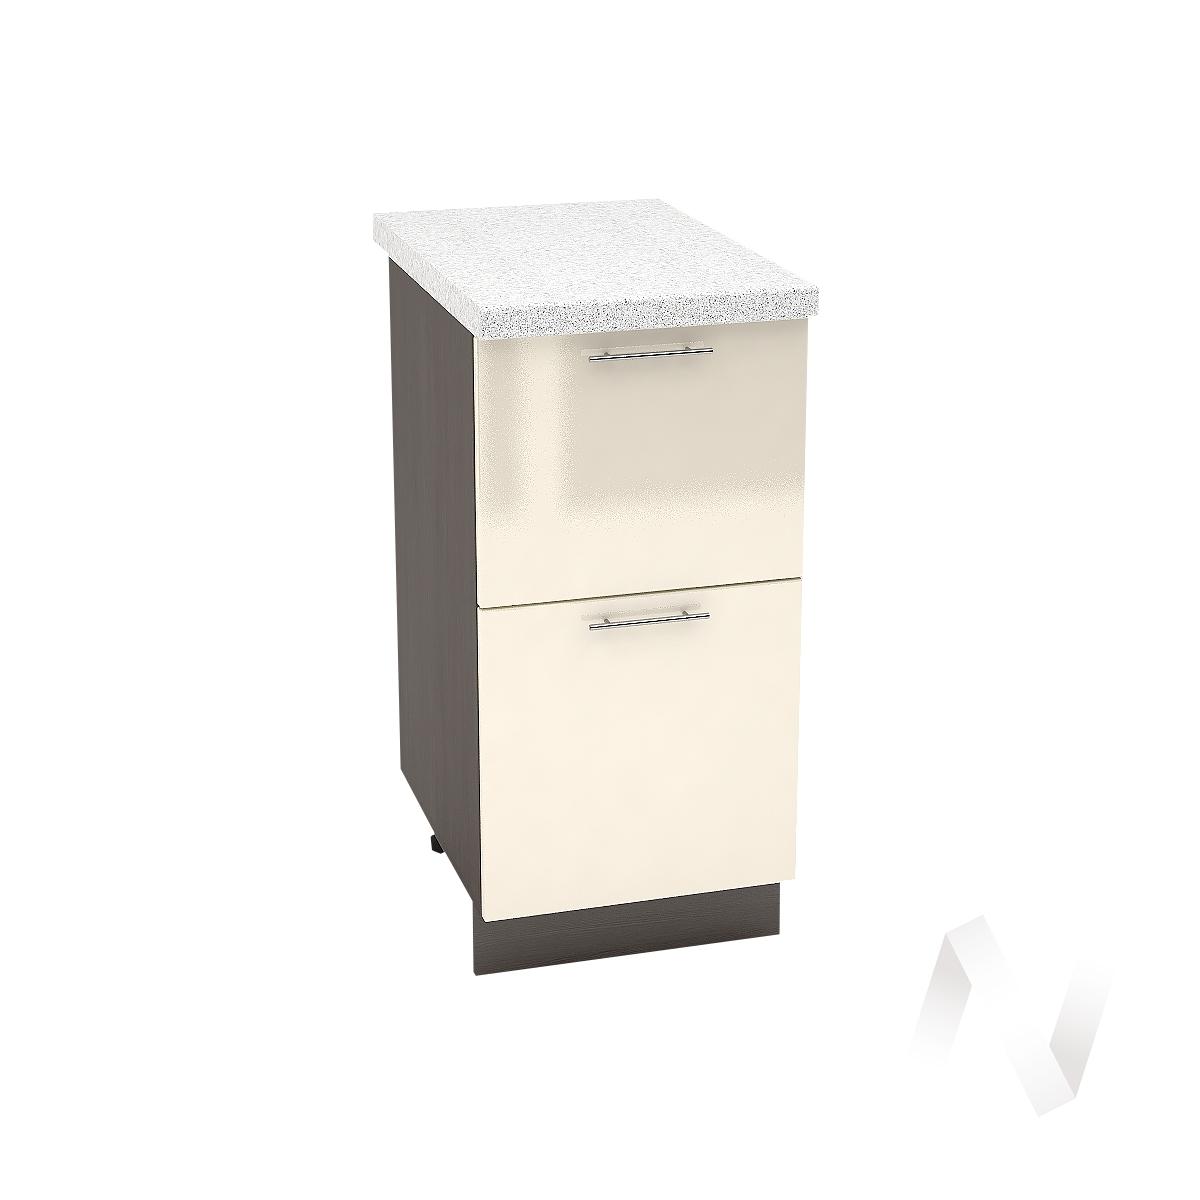 "Кухня ""Валерия-М"": Шкаф нижний с 2-мя ящиками 400, ШН2Я 400 (Ваниль глянец/корпус венге) УТ-000274"